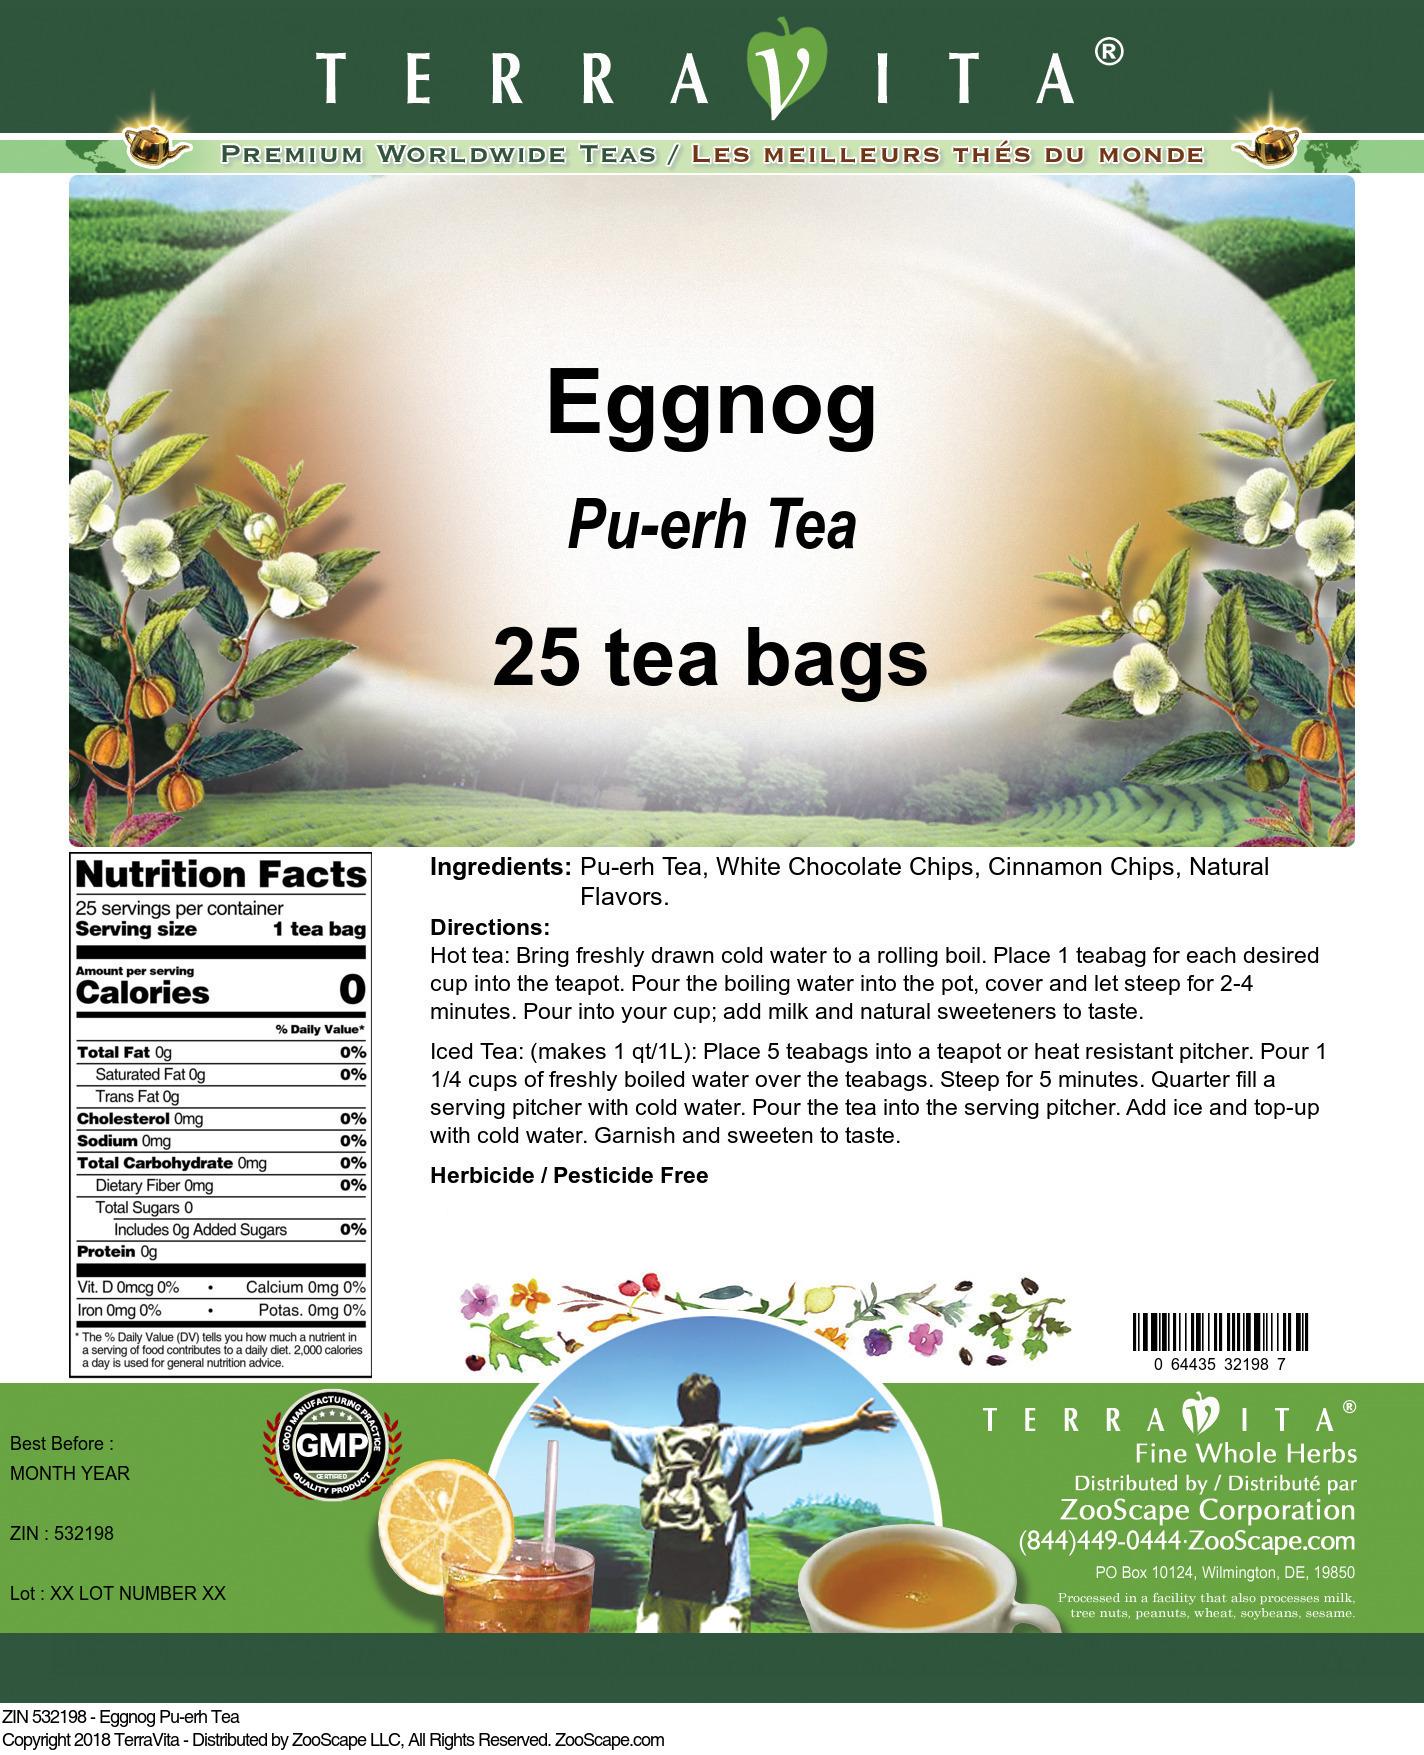 Eggnog Pu-erh Tea